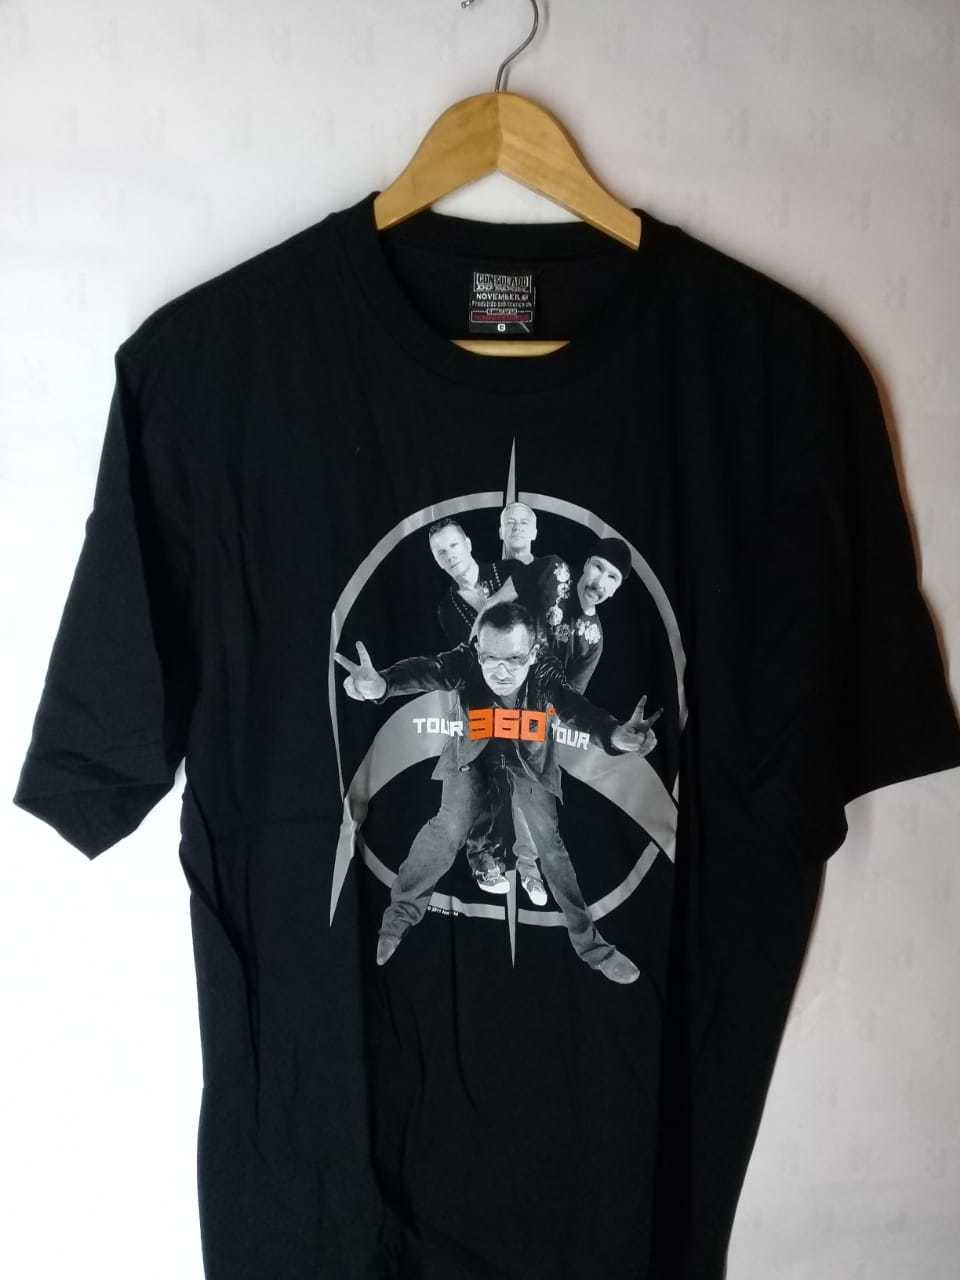 Camiseta Masculina U2  Tour 360